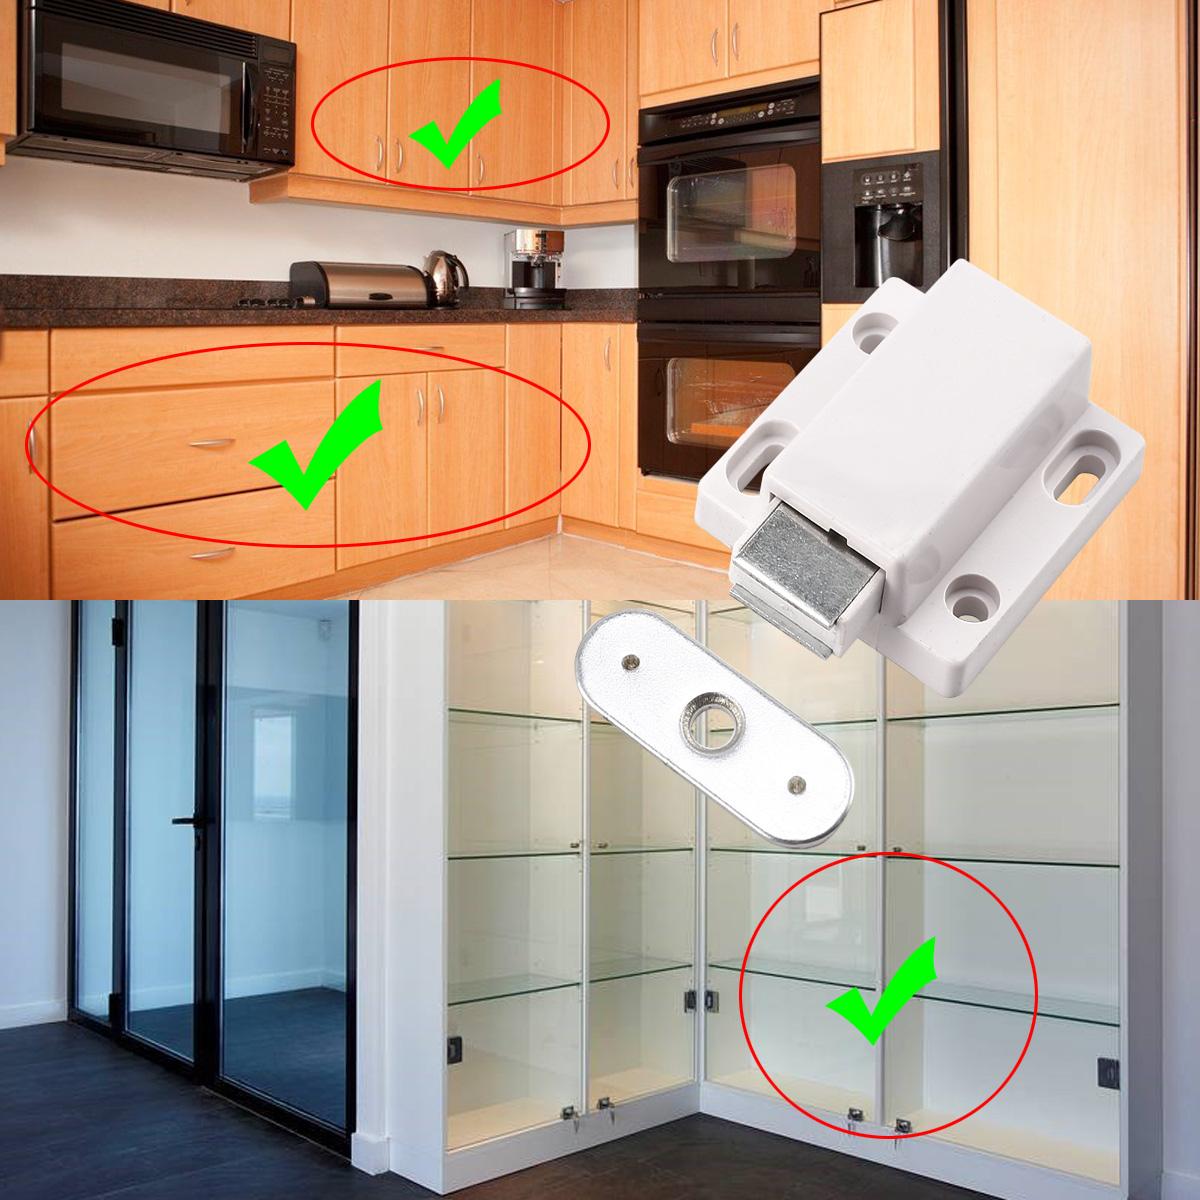 Open Kitchen Gate: Push To Open Latches Magnetic Pressure Catches Kitchen Caravan Cabinet Doors